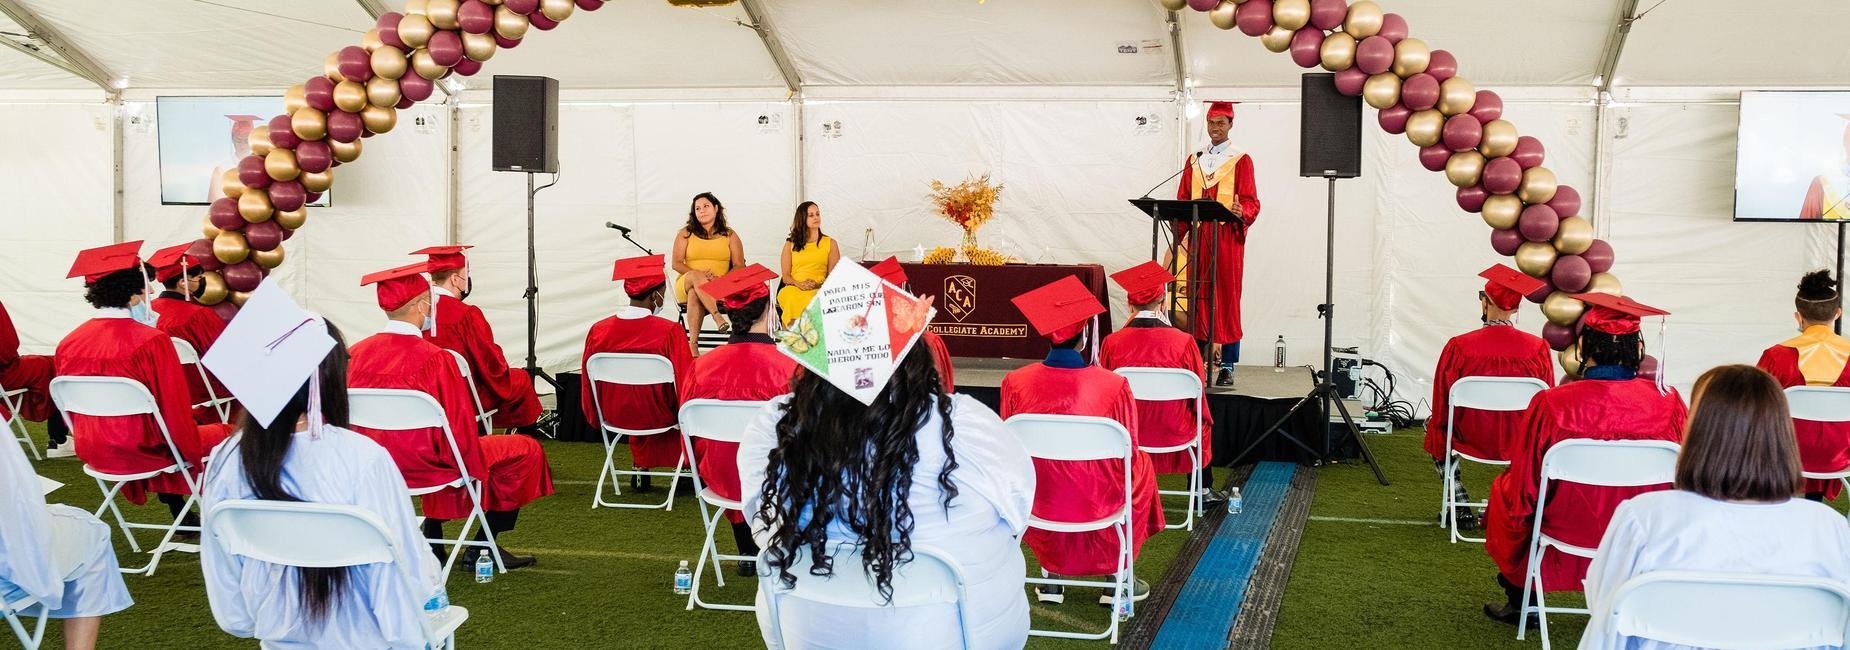 2021 Graduation